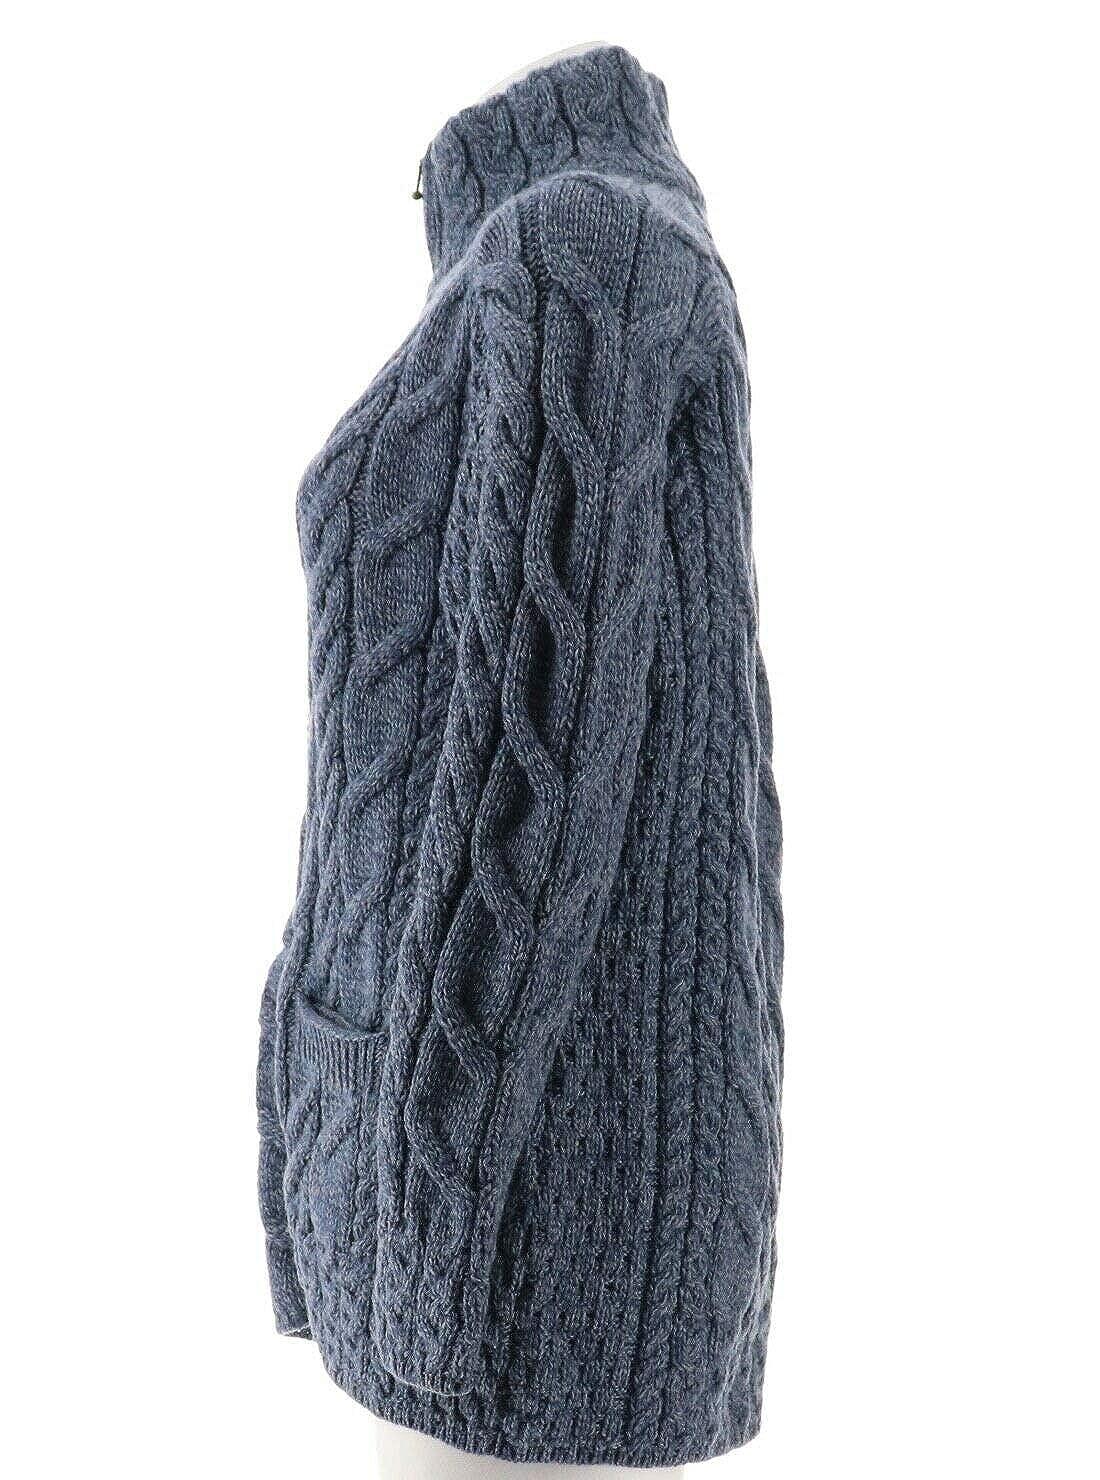 Kilronan Merino Wool Zip Front Sweater Stand Collar A305729